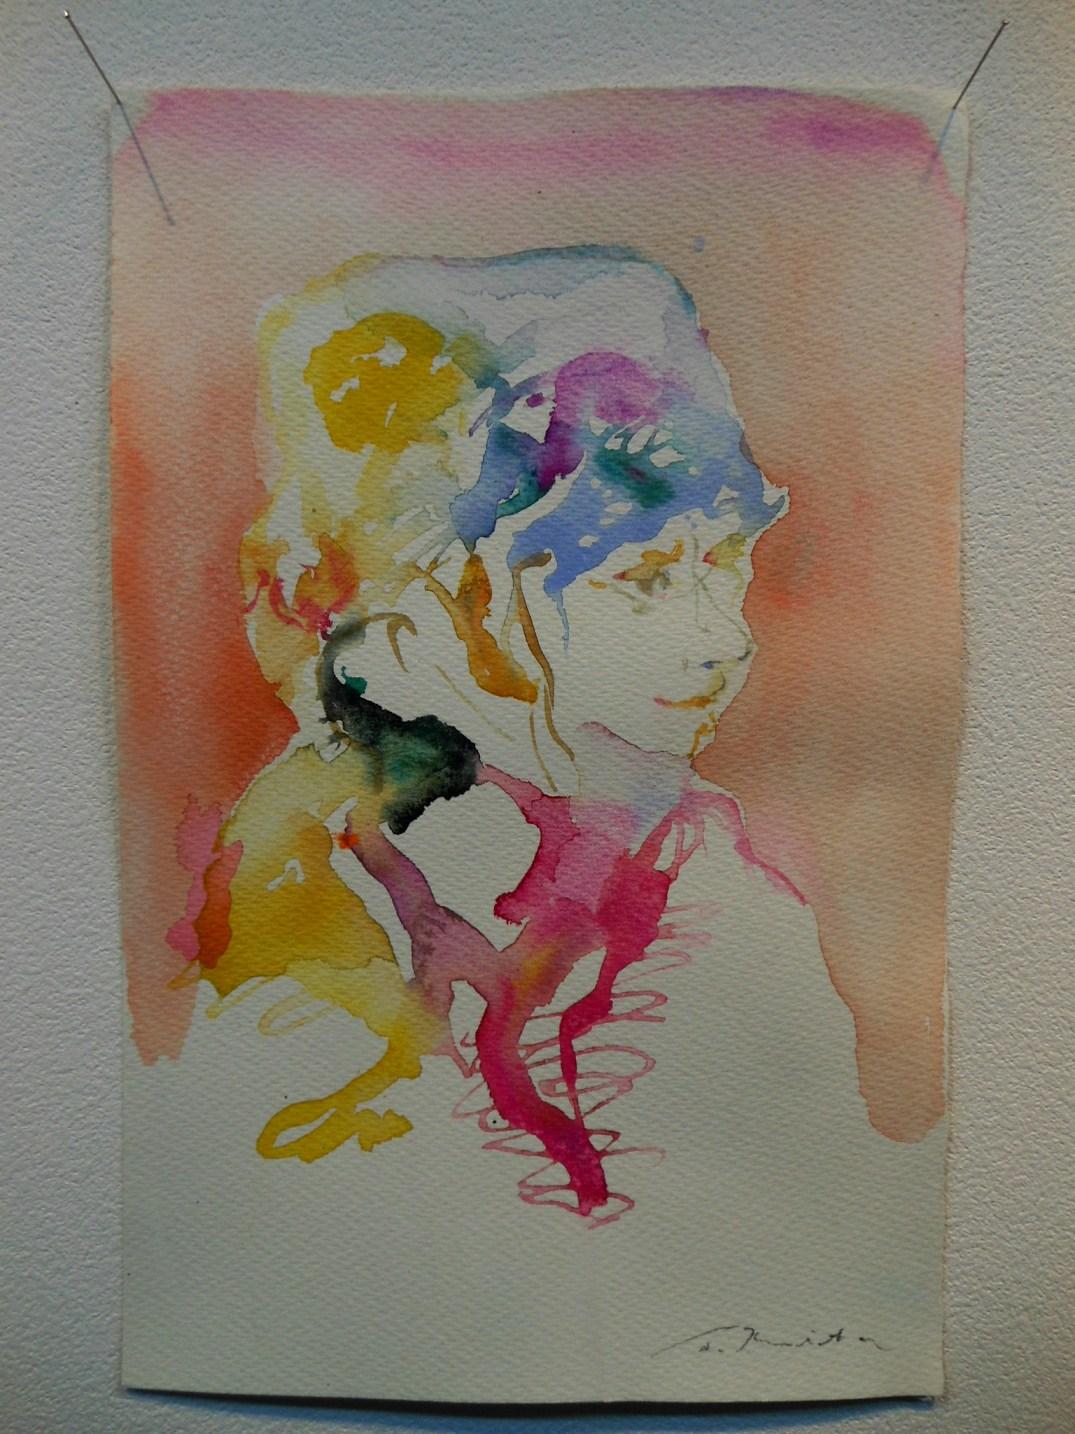 1650) 「栗田健・絵画展 『Portrait』」 af 終了・2月21日(火)~3月5日(月)_f0126829_20482261.jpg